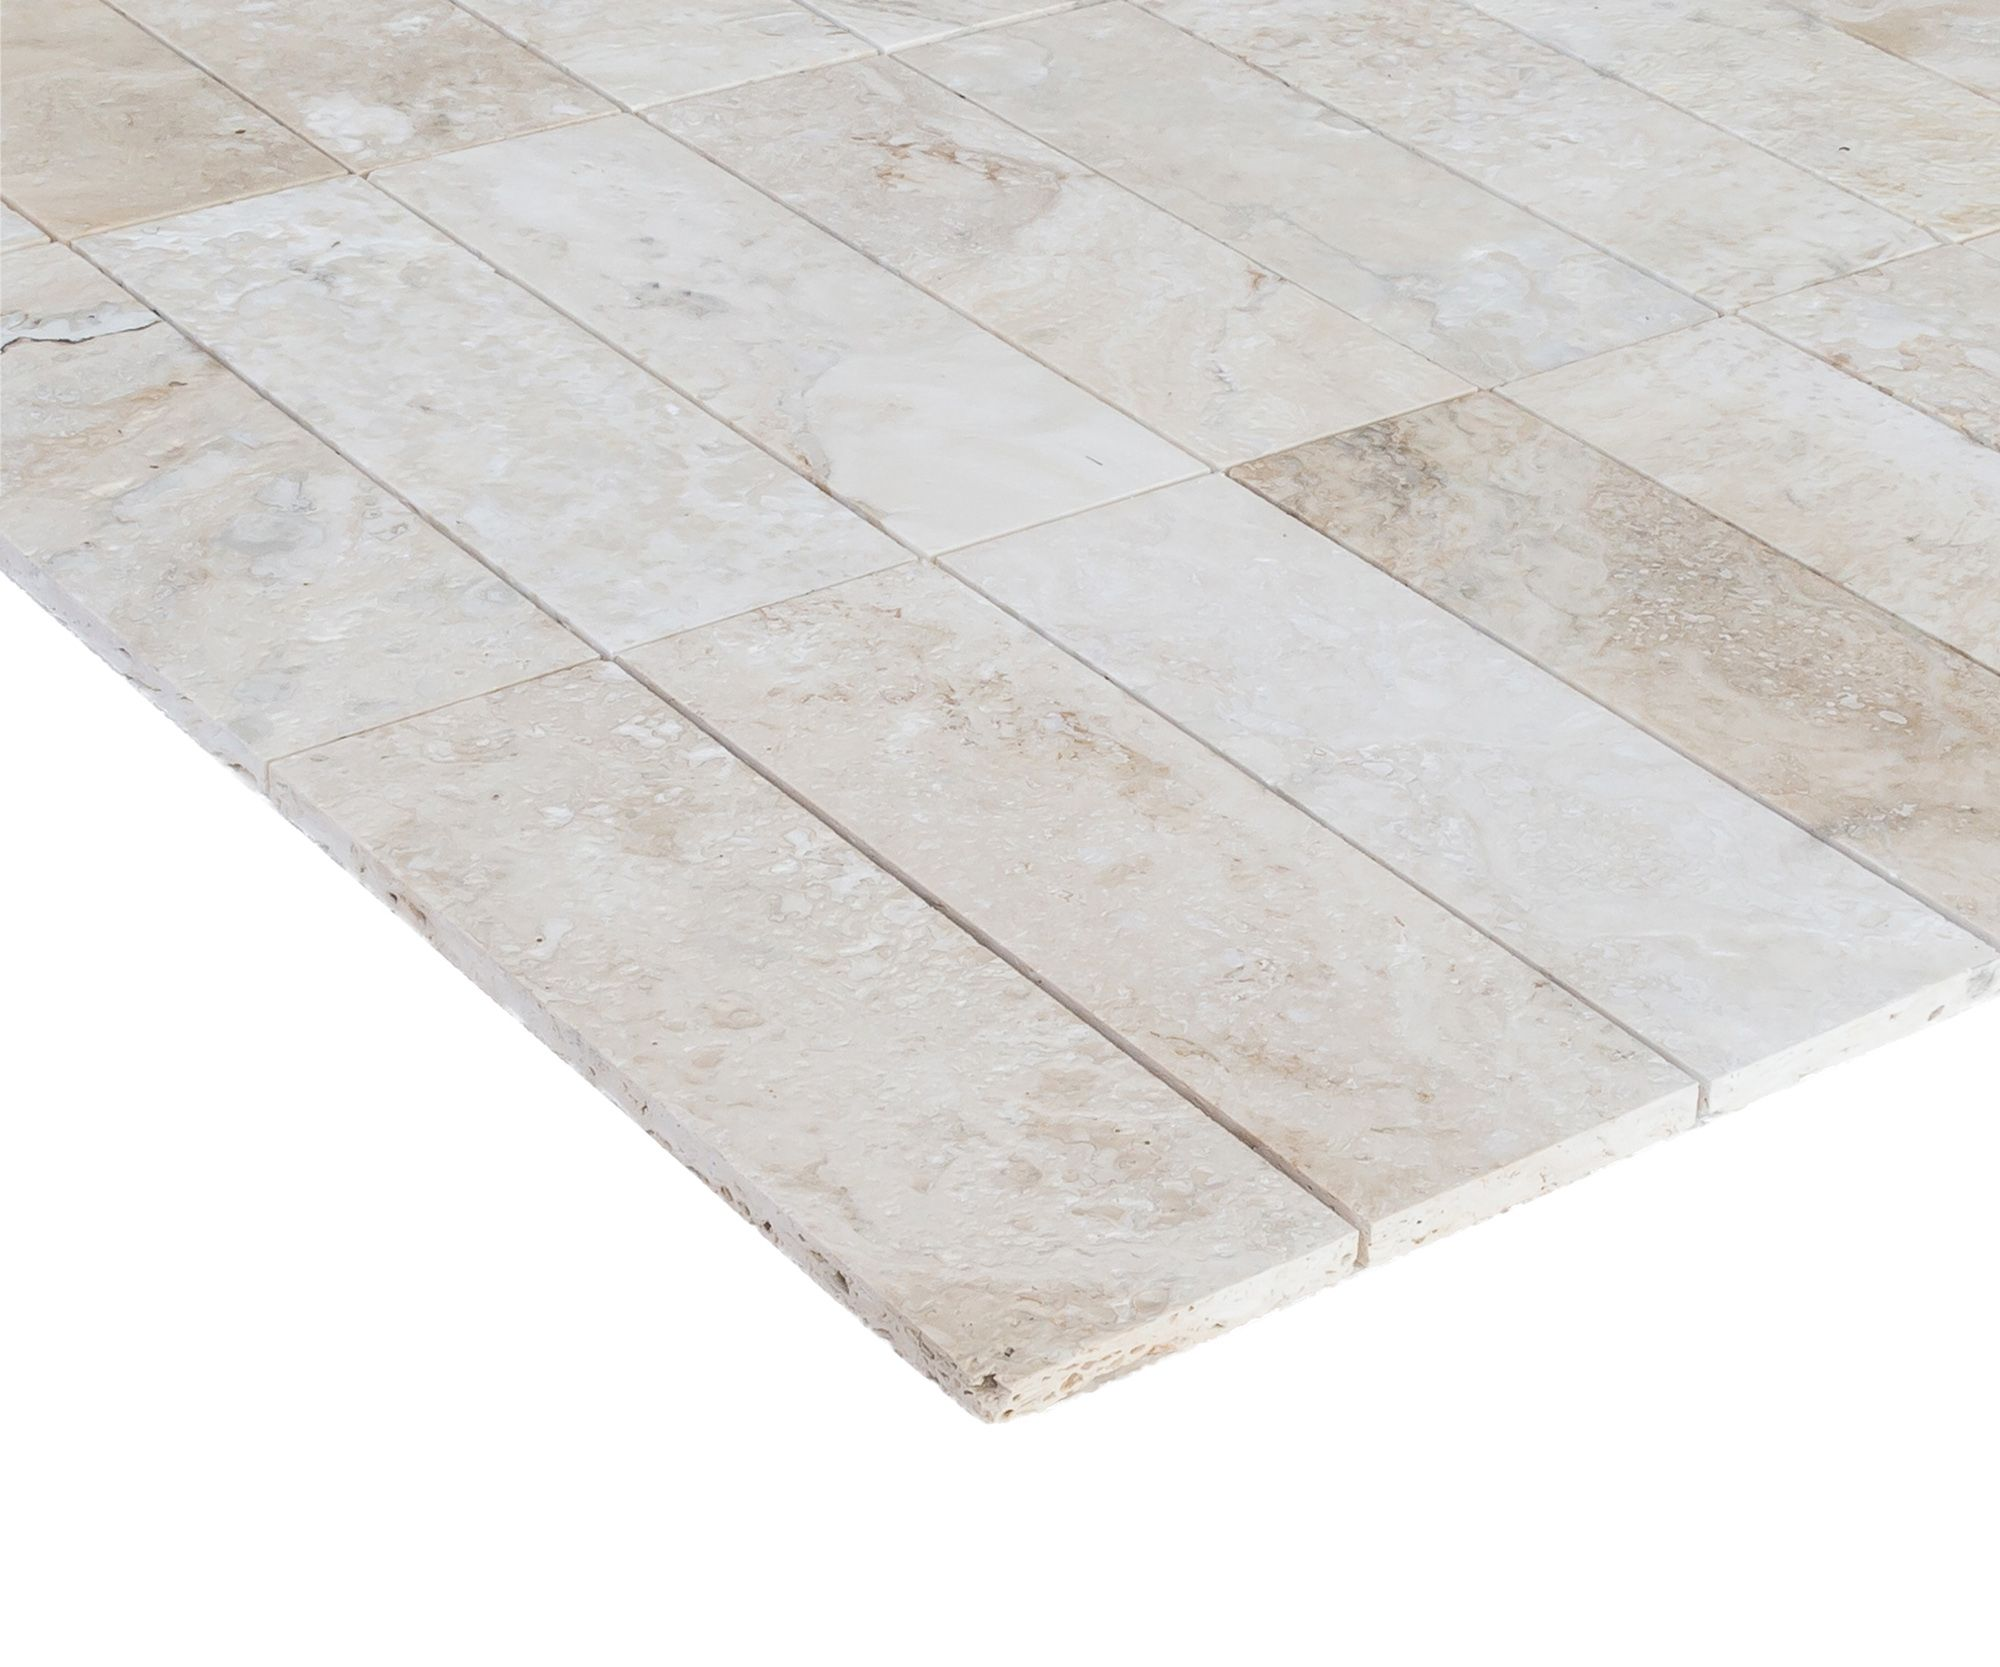 Travertine tile brushed travertine tile travertine and lights